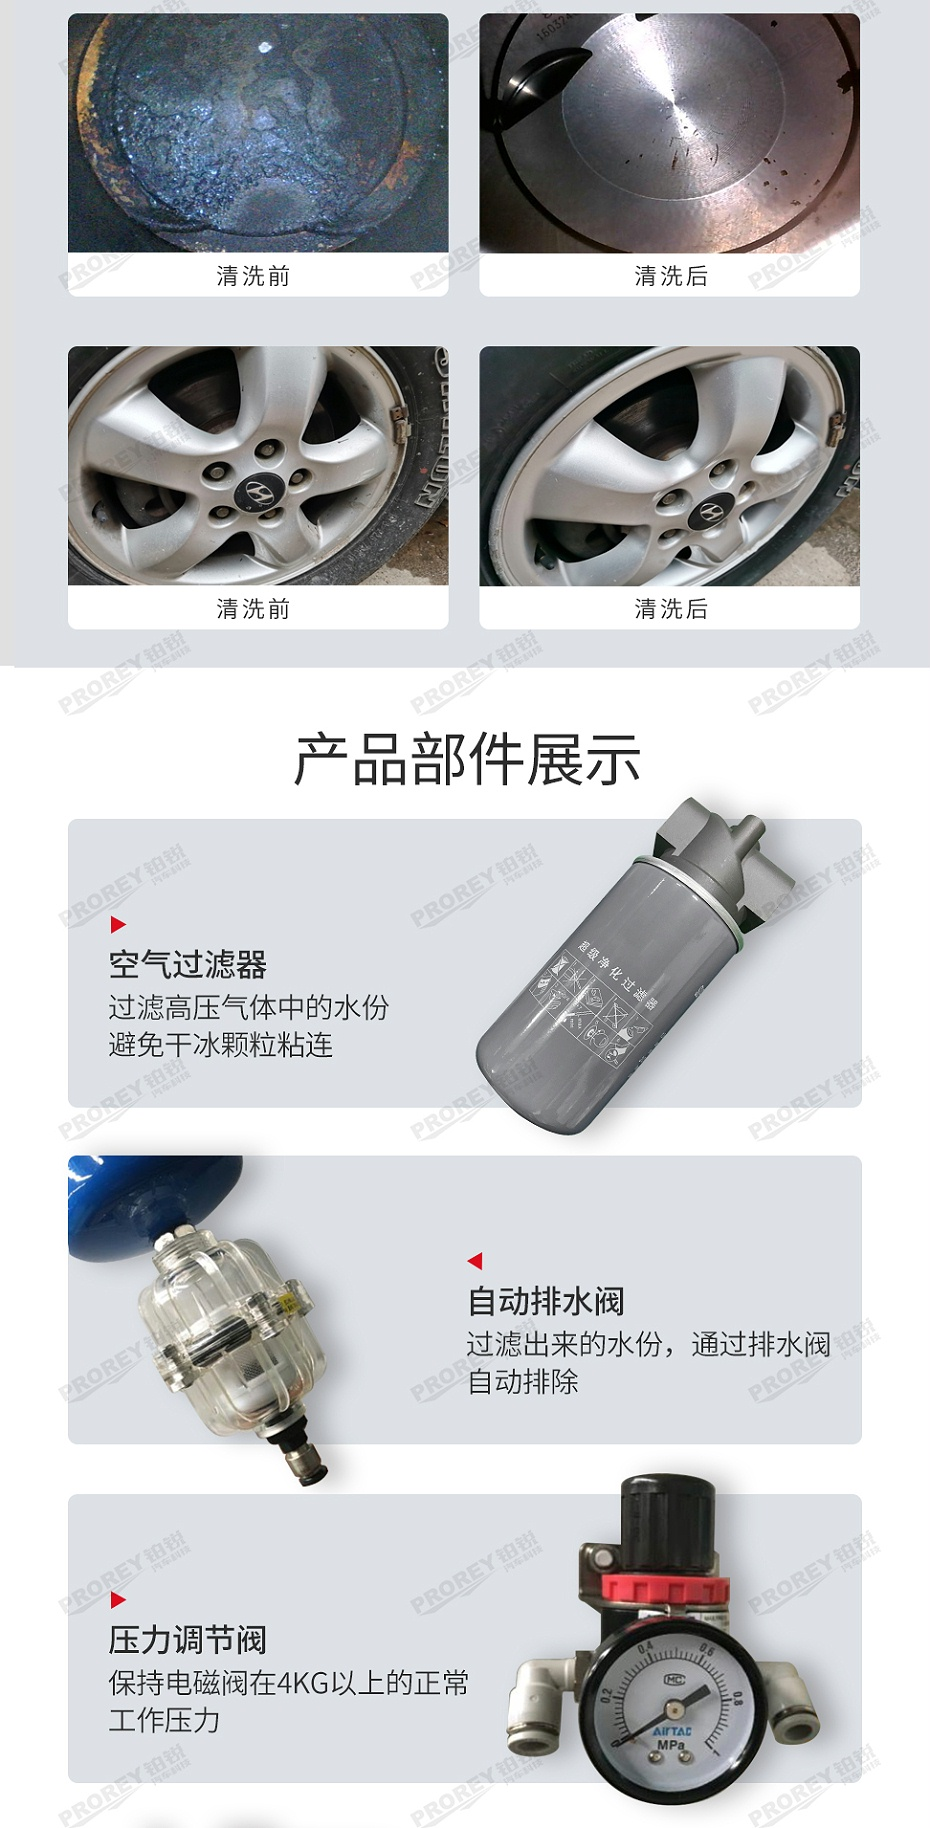 GW-130041449-浦而曼 DIC26 干冰清洗机-4